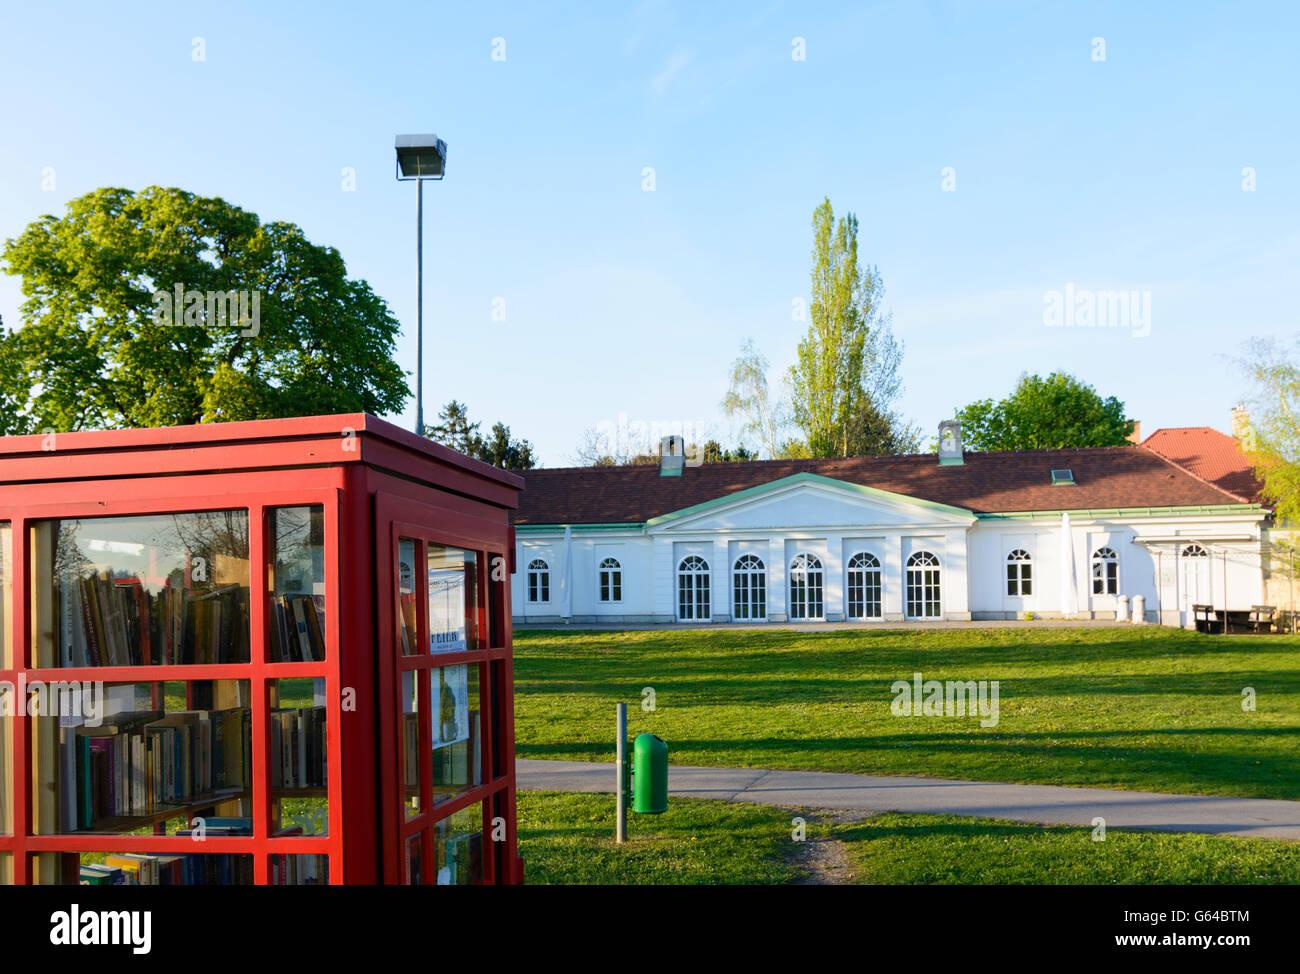 Castle Seyring with book exchange occasion in a red telephone booth, Gerasdorf bei Wien, Austria, Niederösterreich, - Stock Image